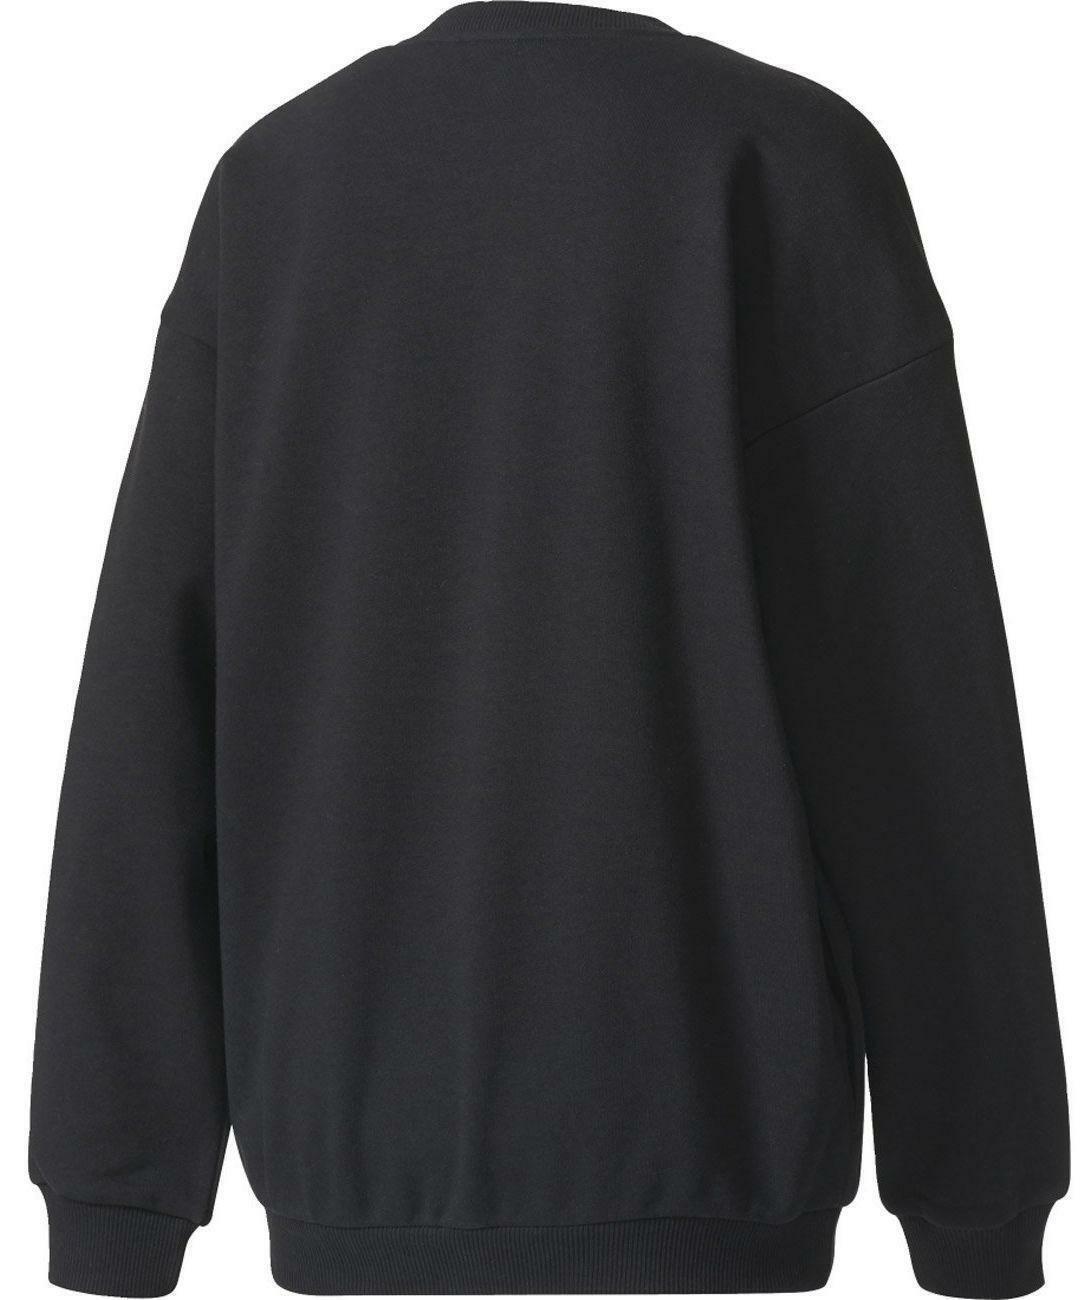 adidas originals adidas trefoil hoodie felpa donna nera